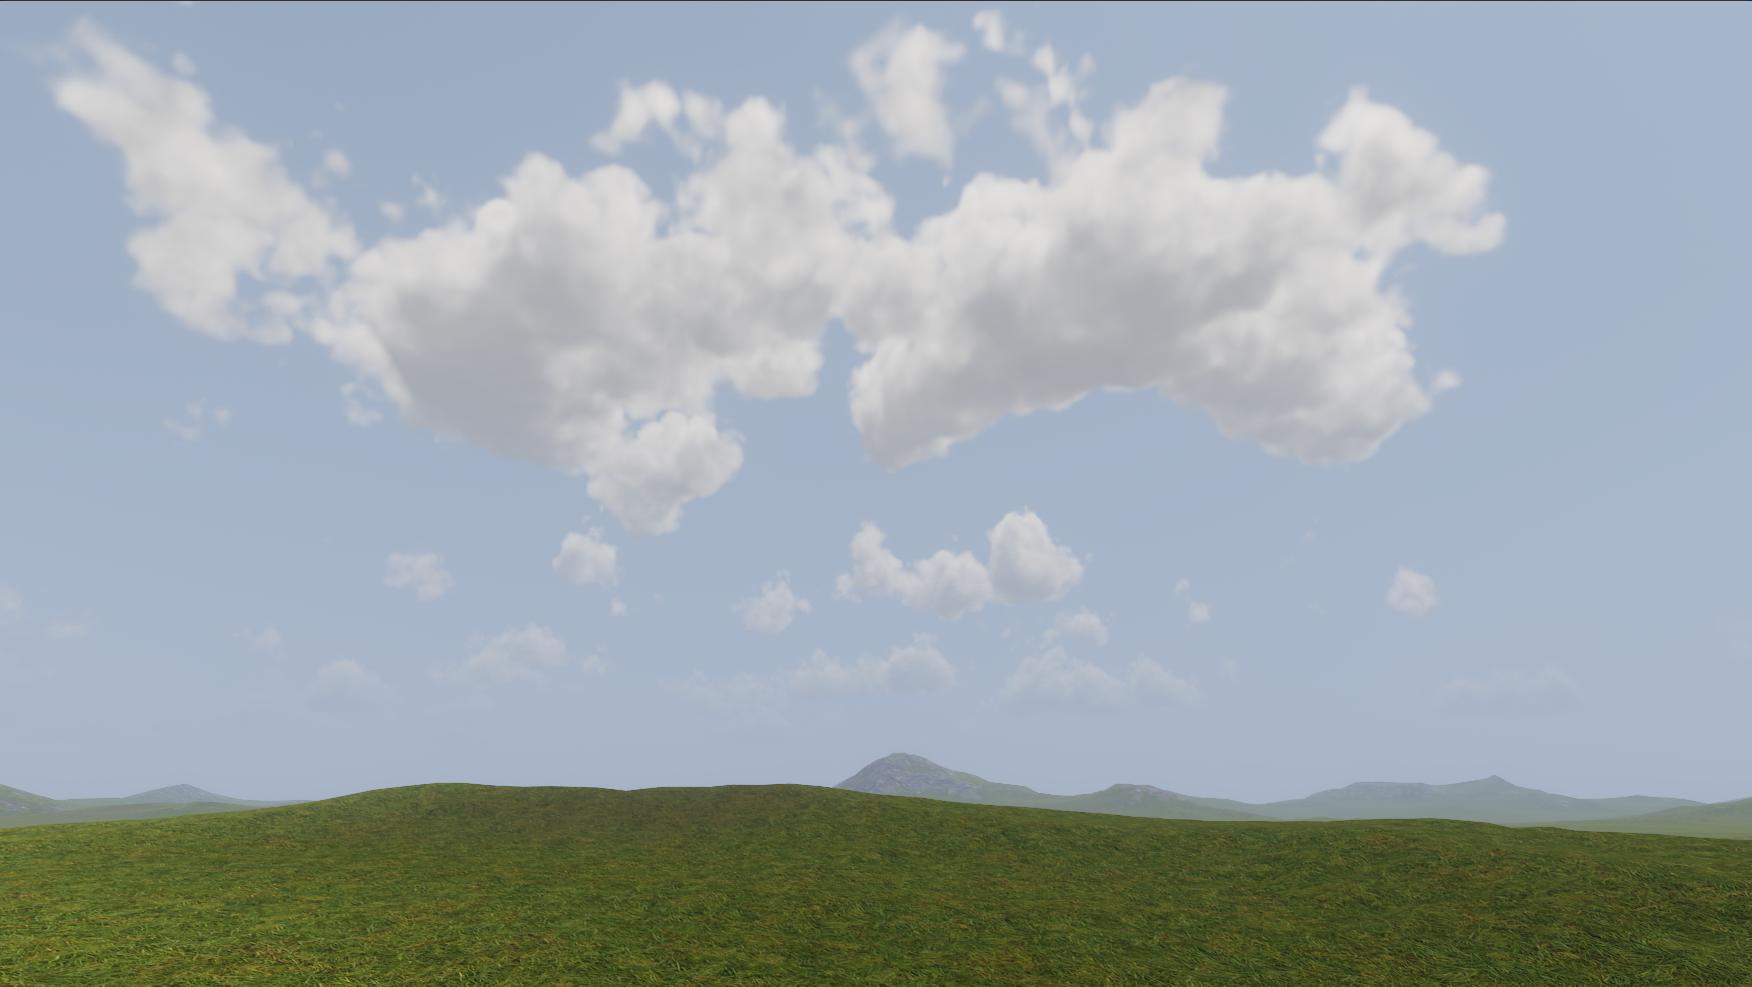 UniStorm_4.0_Clouds.png